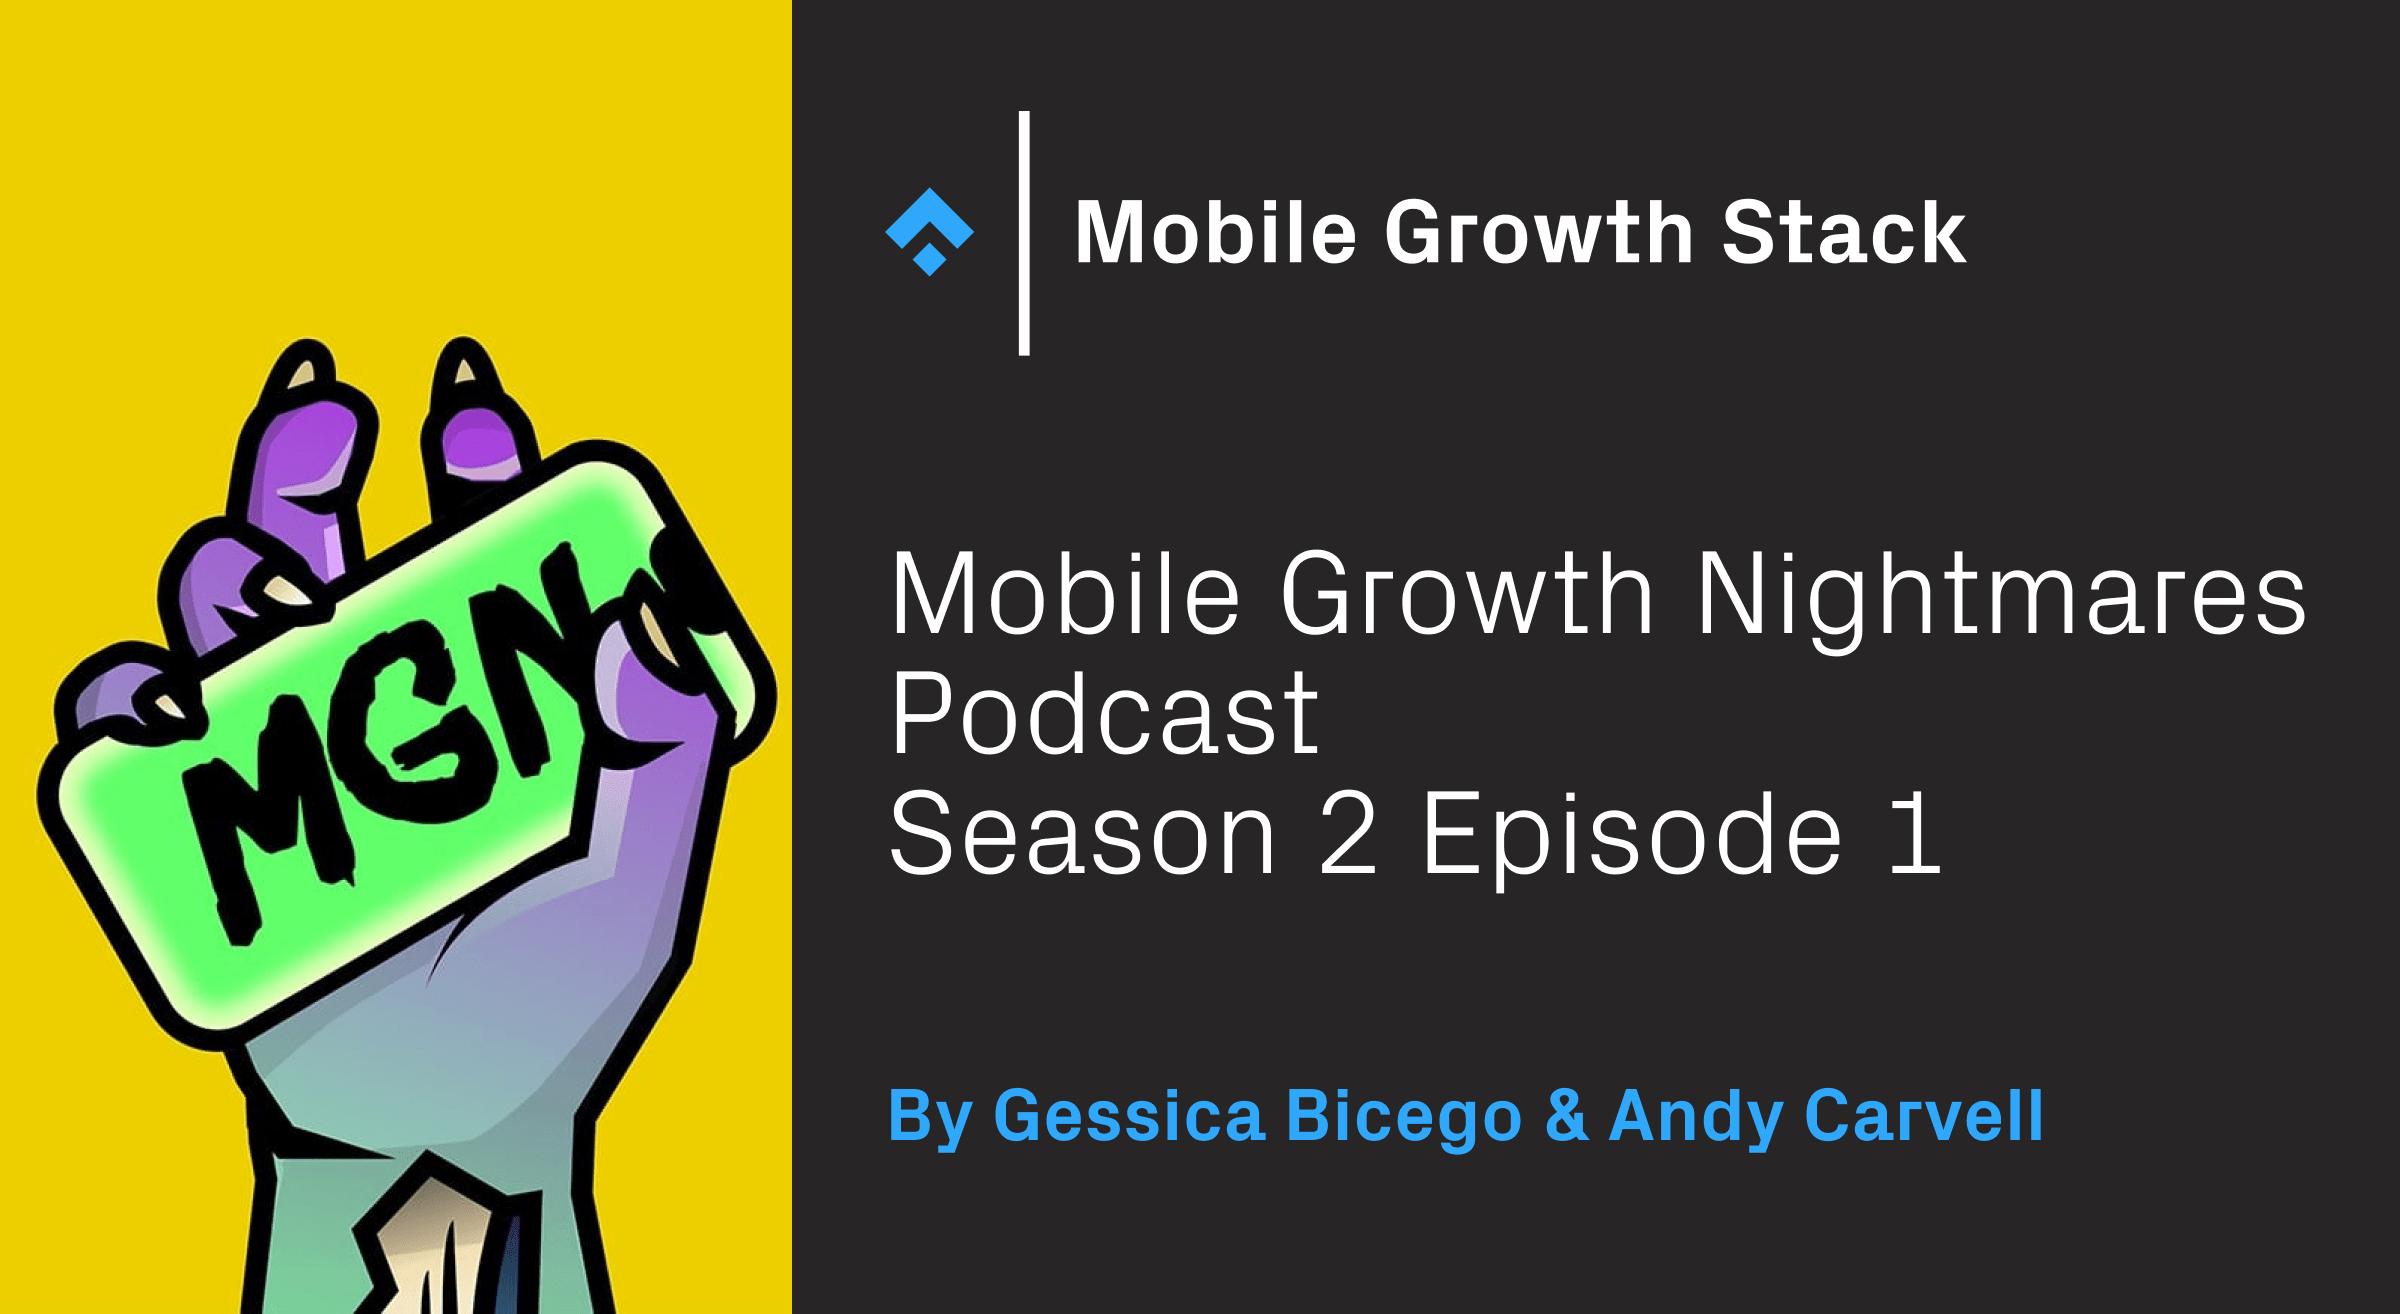 mobile growth nightmares season 2 episode 1